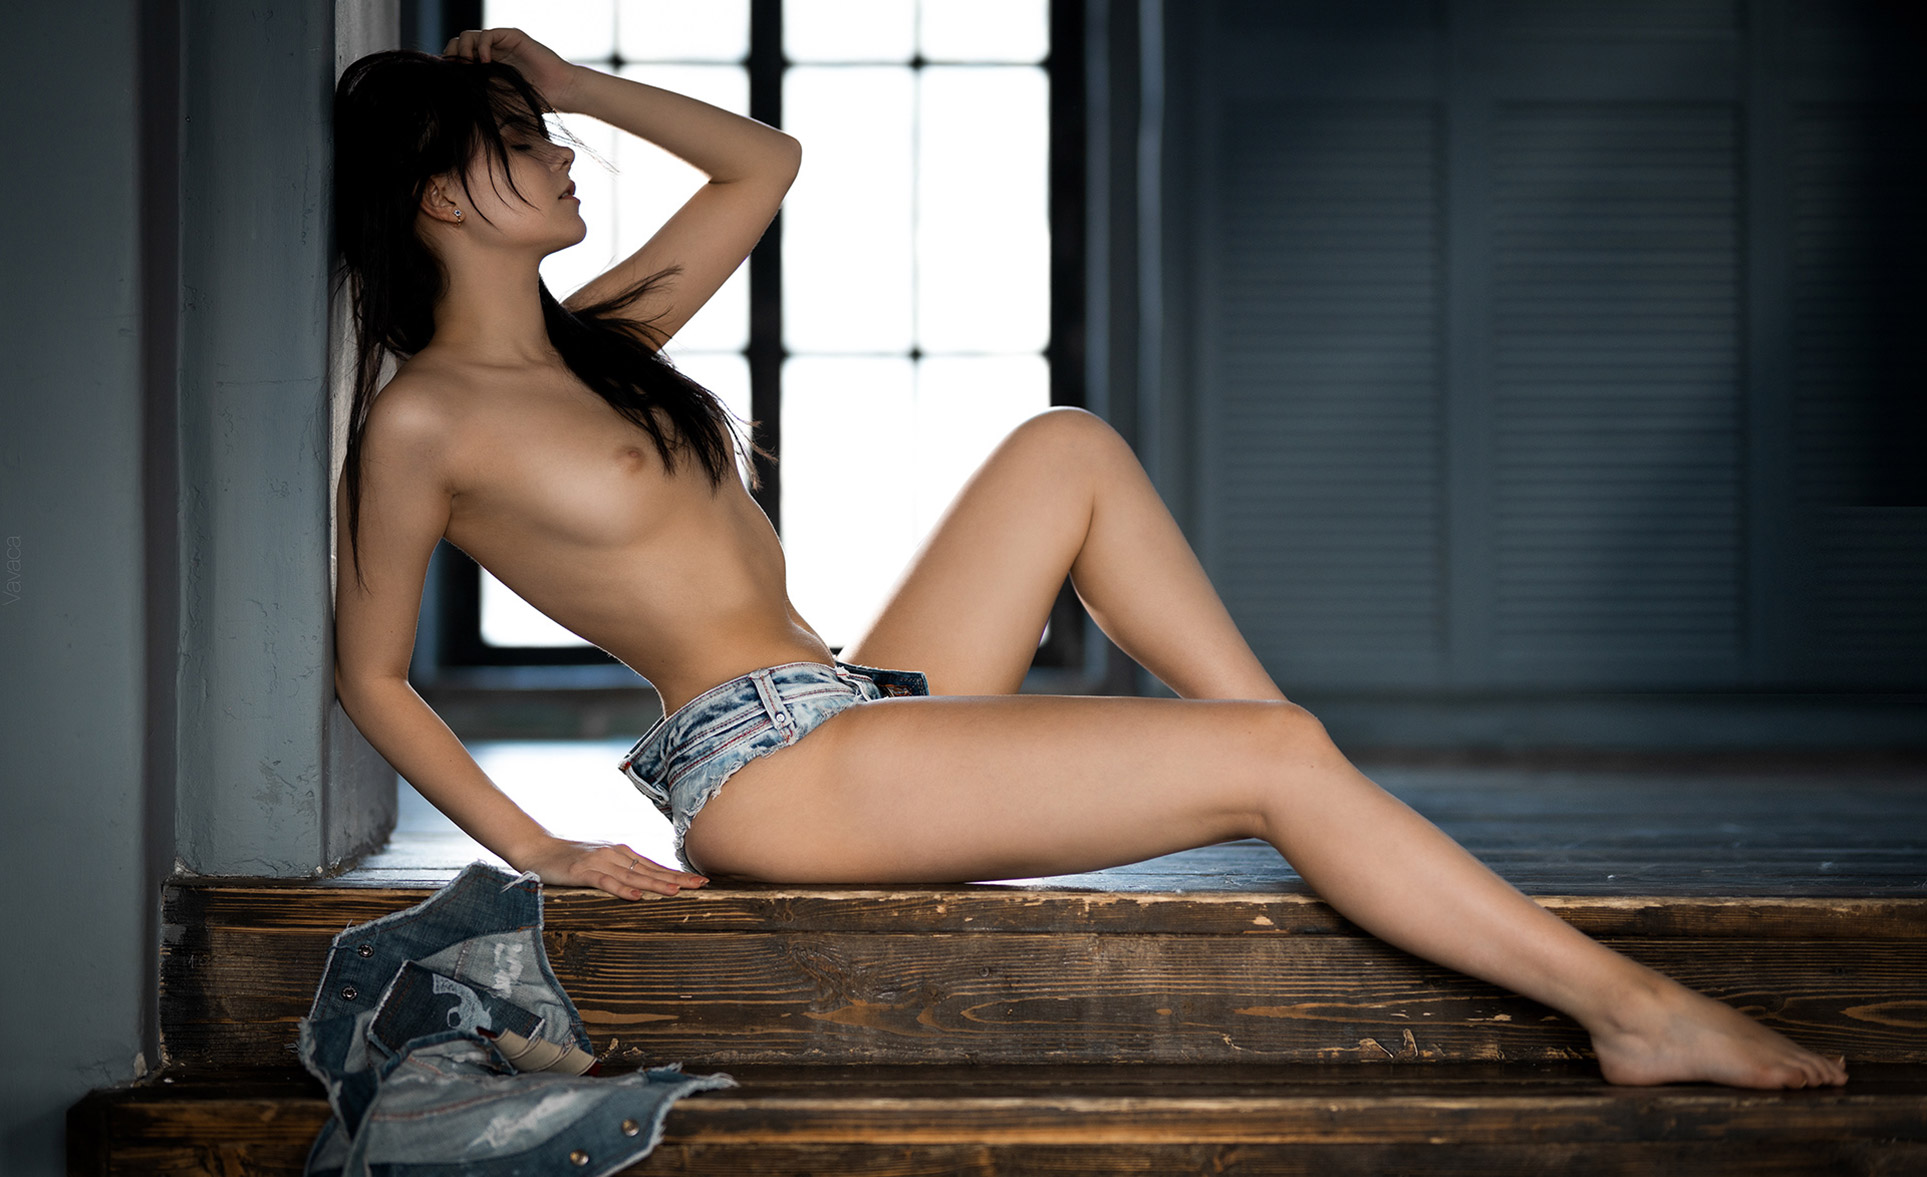 Victoria Sokolova nude by Vladimir Nikolaev